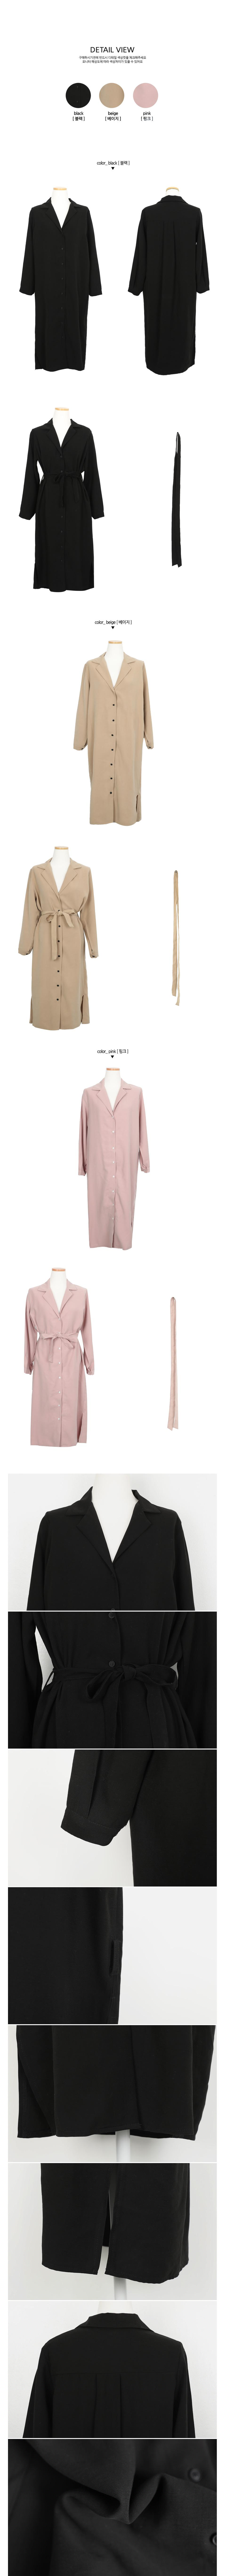 Single transara dress